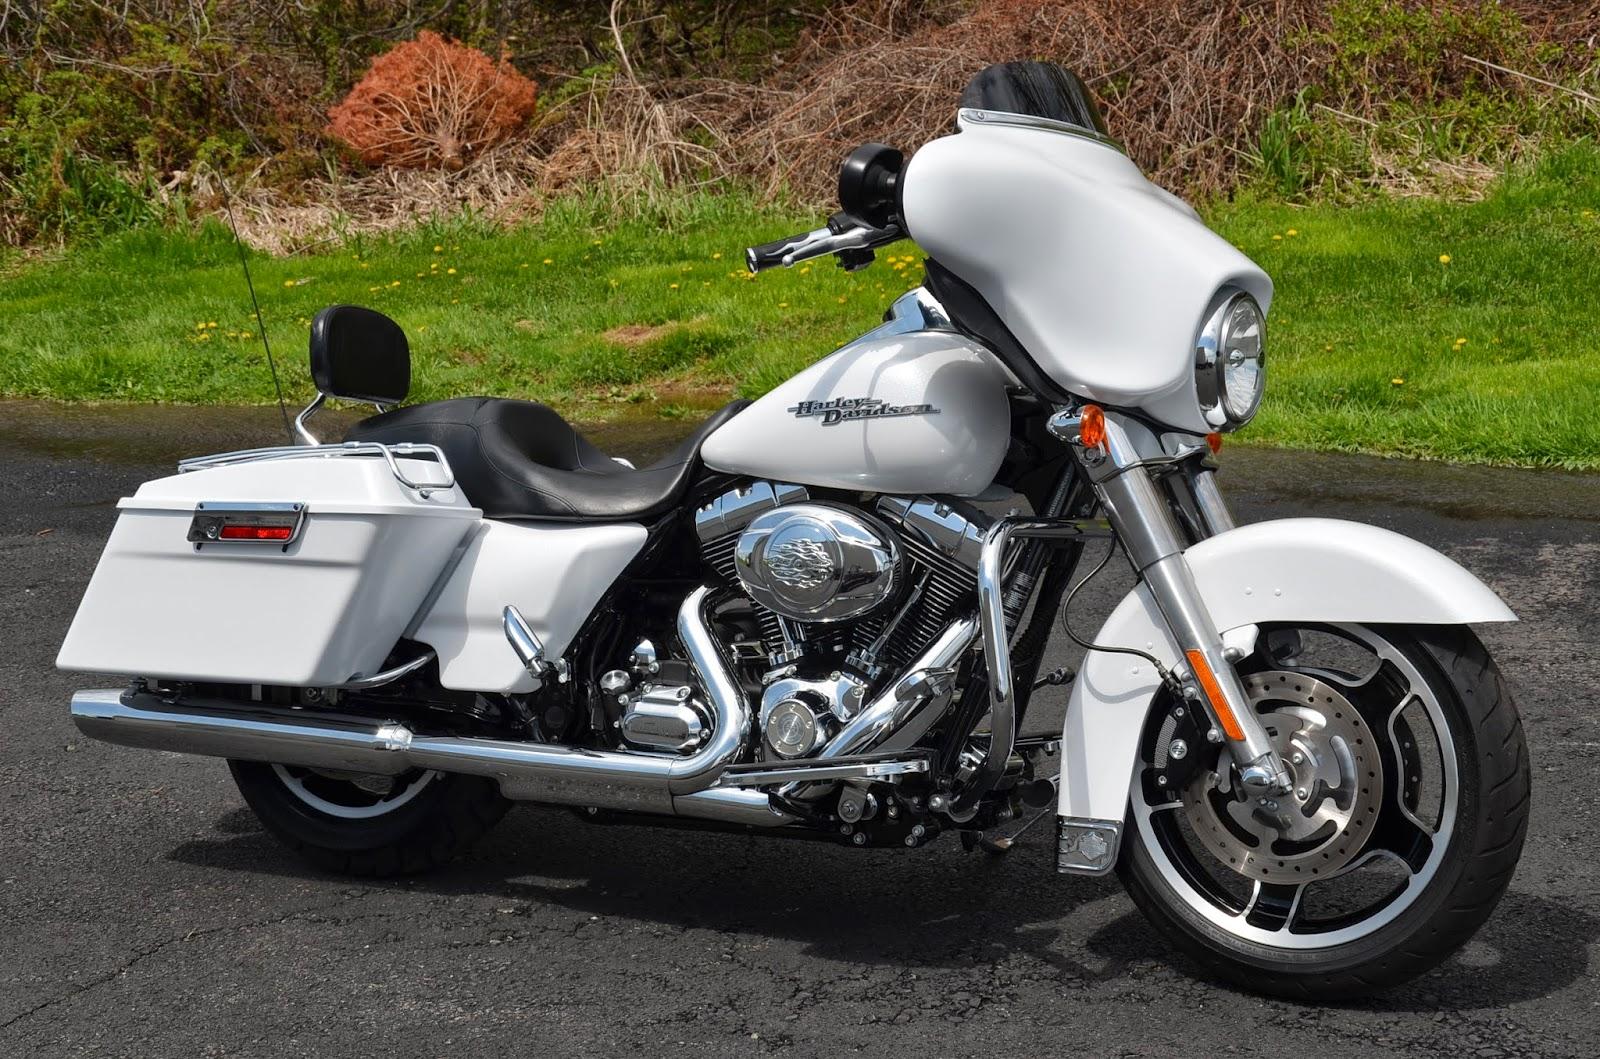 biker excalibur II: 2011 HARLEY DAVIDSON STREET GLIDE FLHX ...